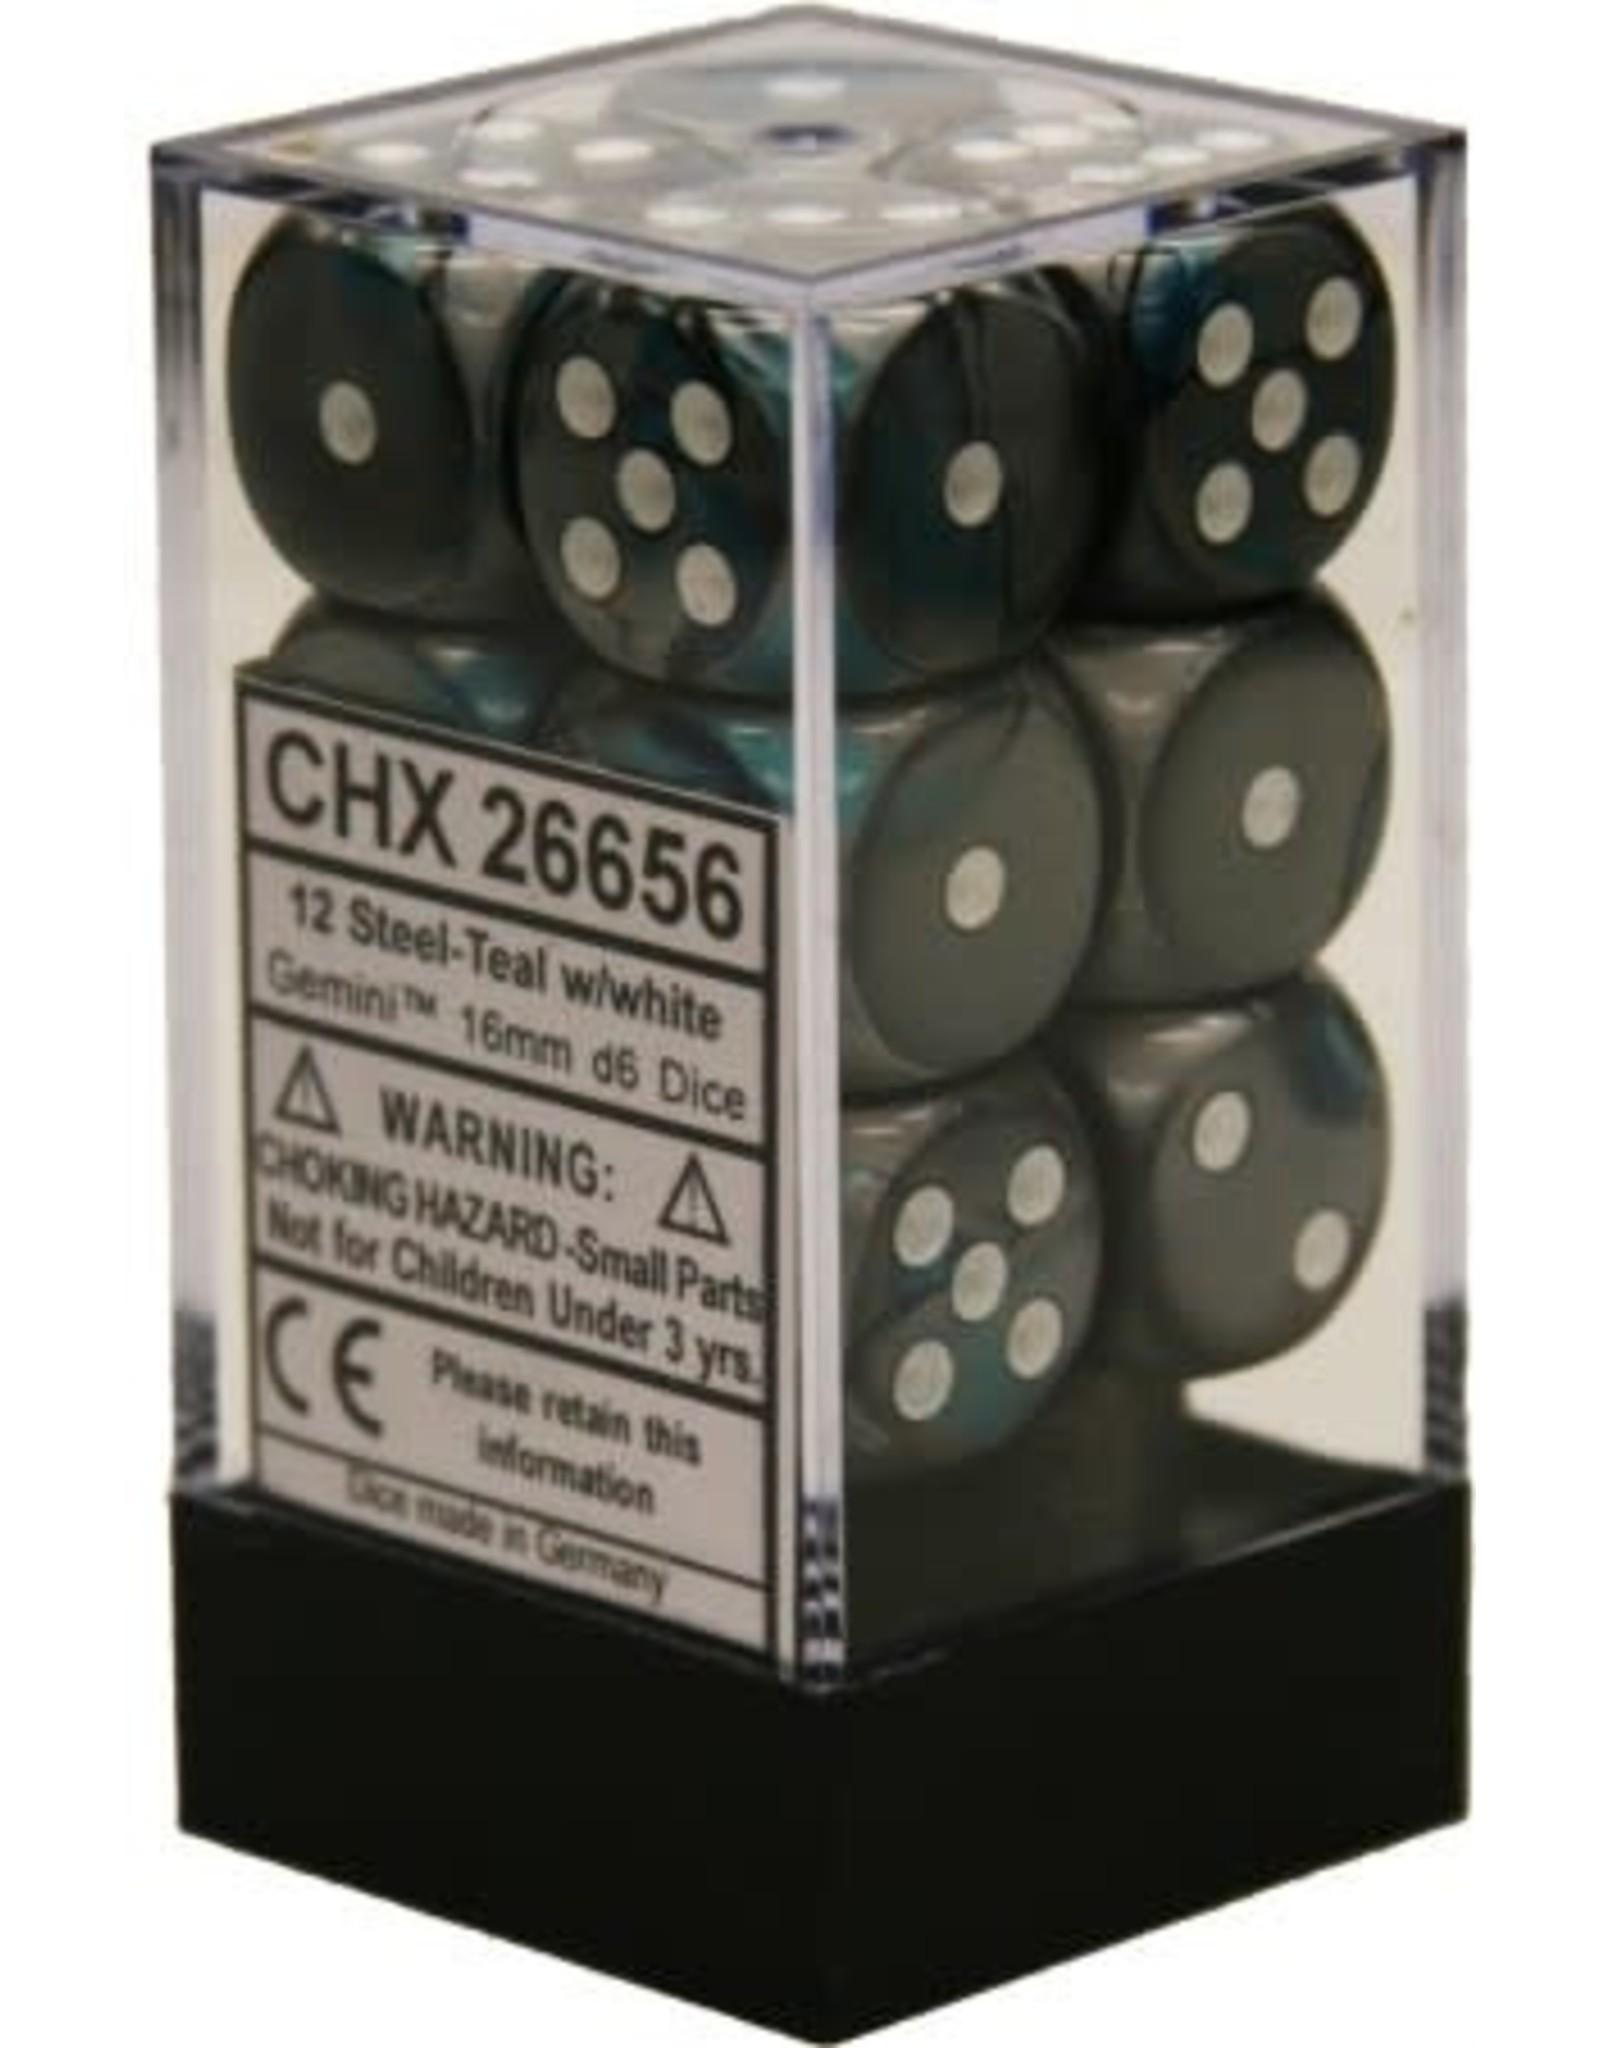 CHESSEX GEMINI 12D6 STEEL-TEAL/WHITE 16MM